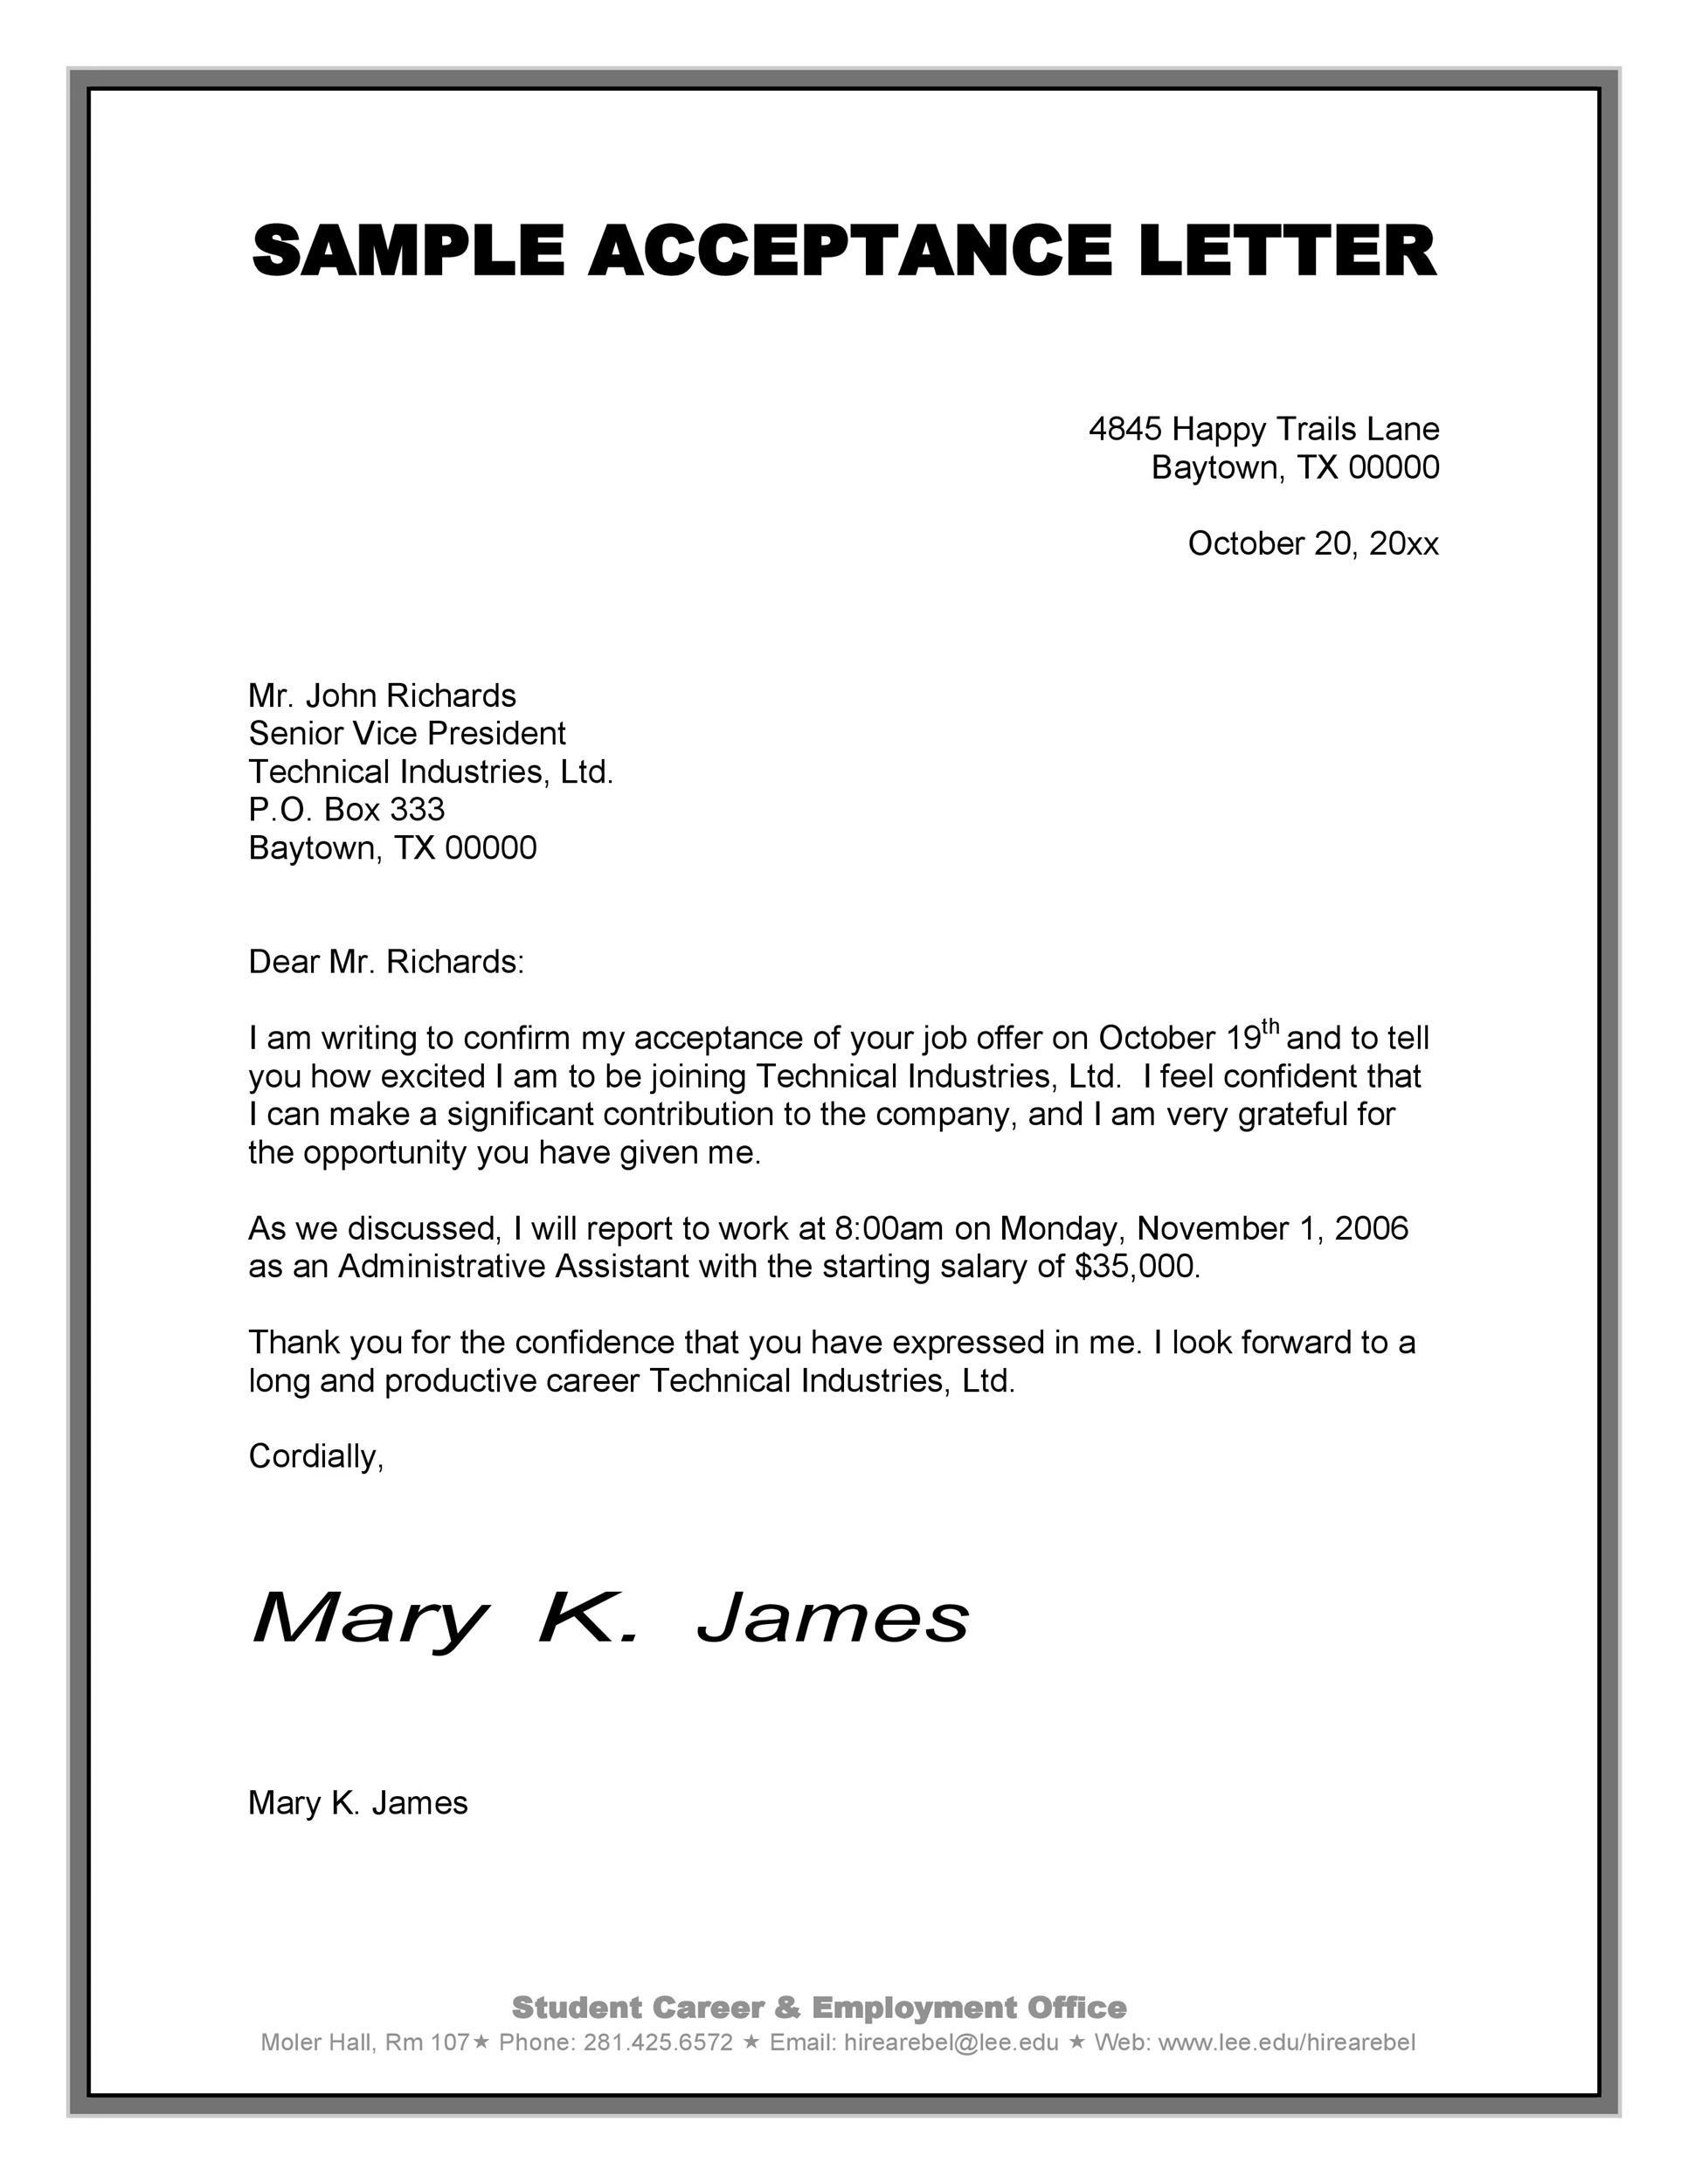 Free job acceptance letter 26